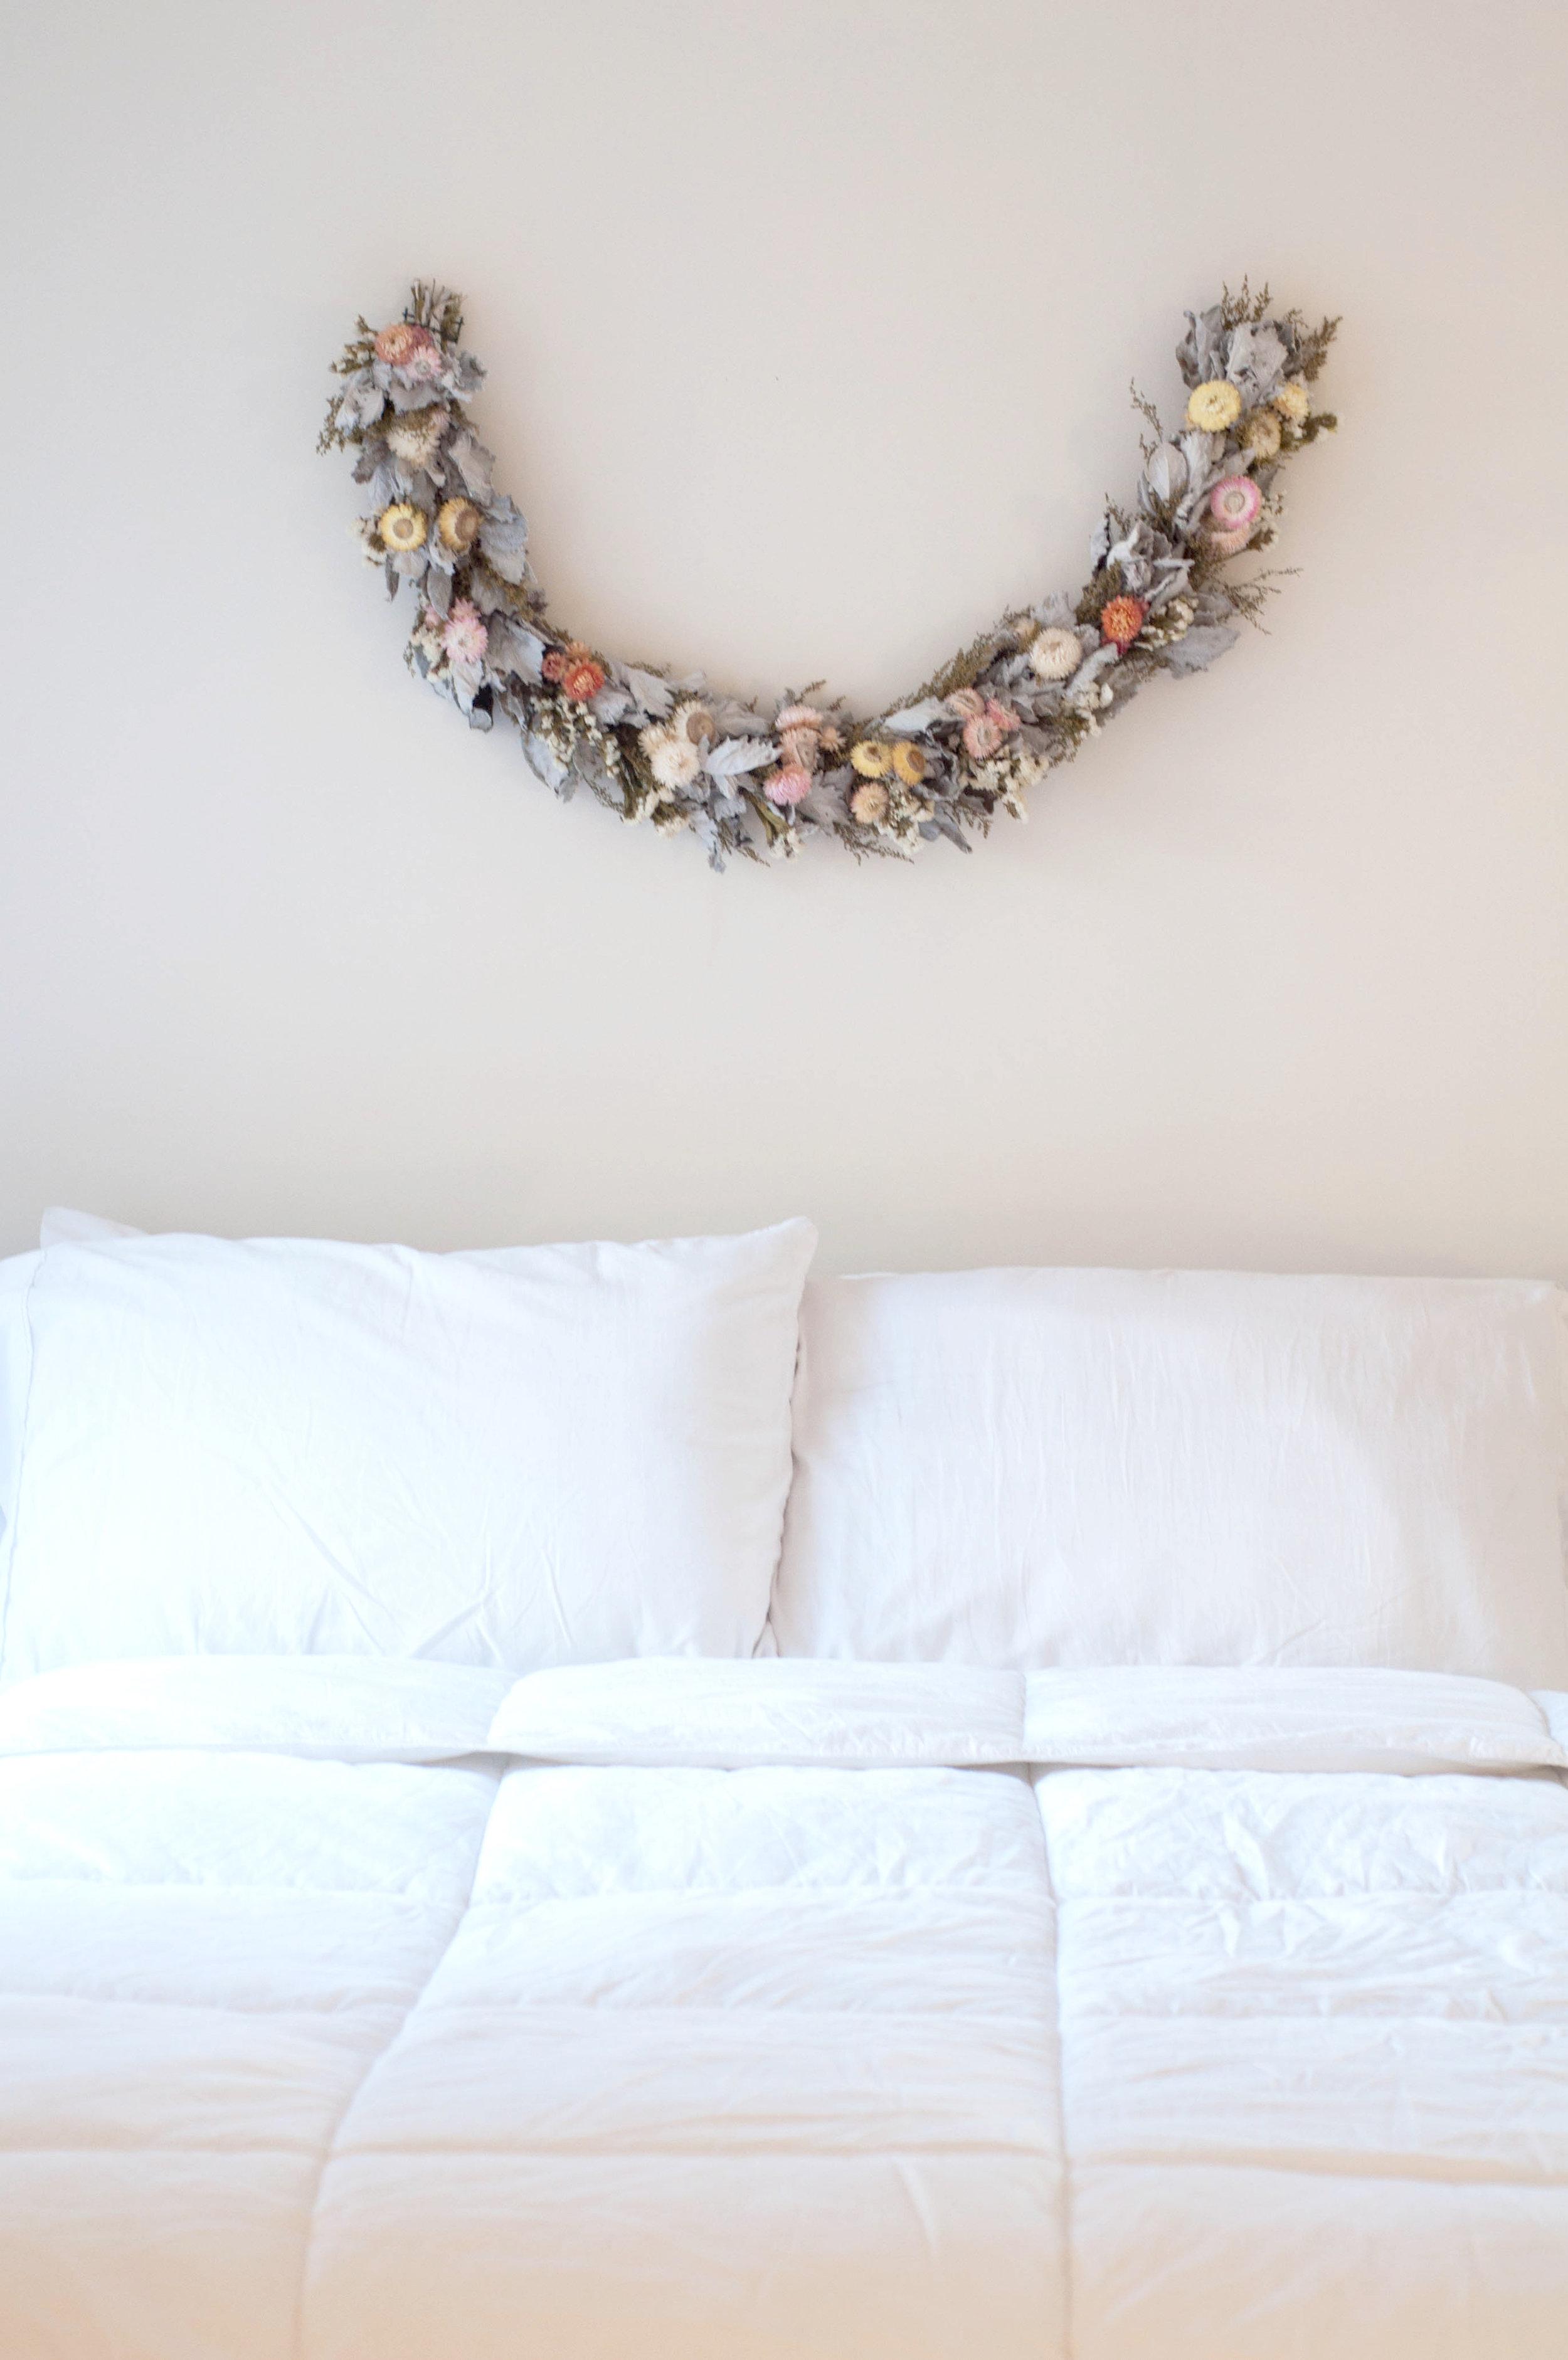 dried floral arch2.jpg